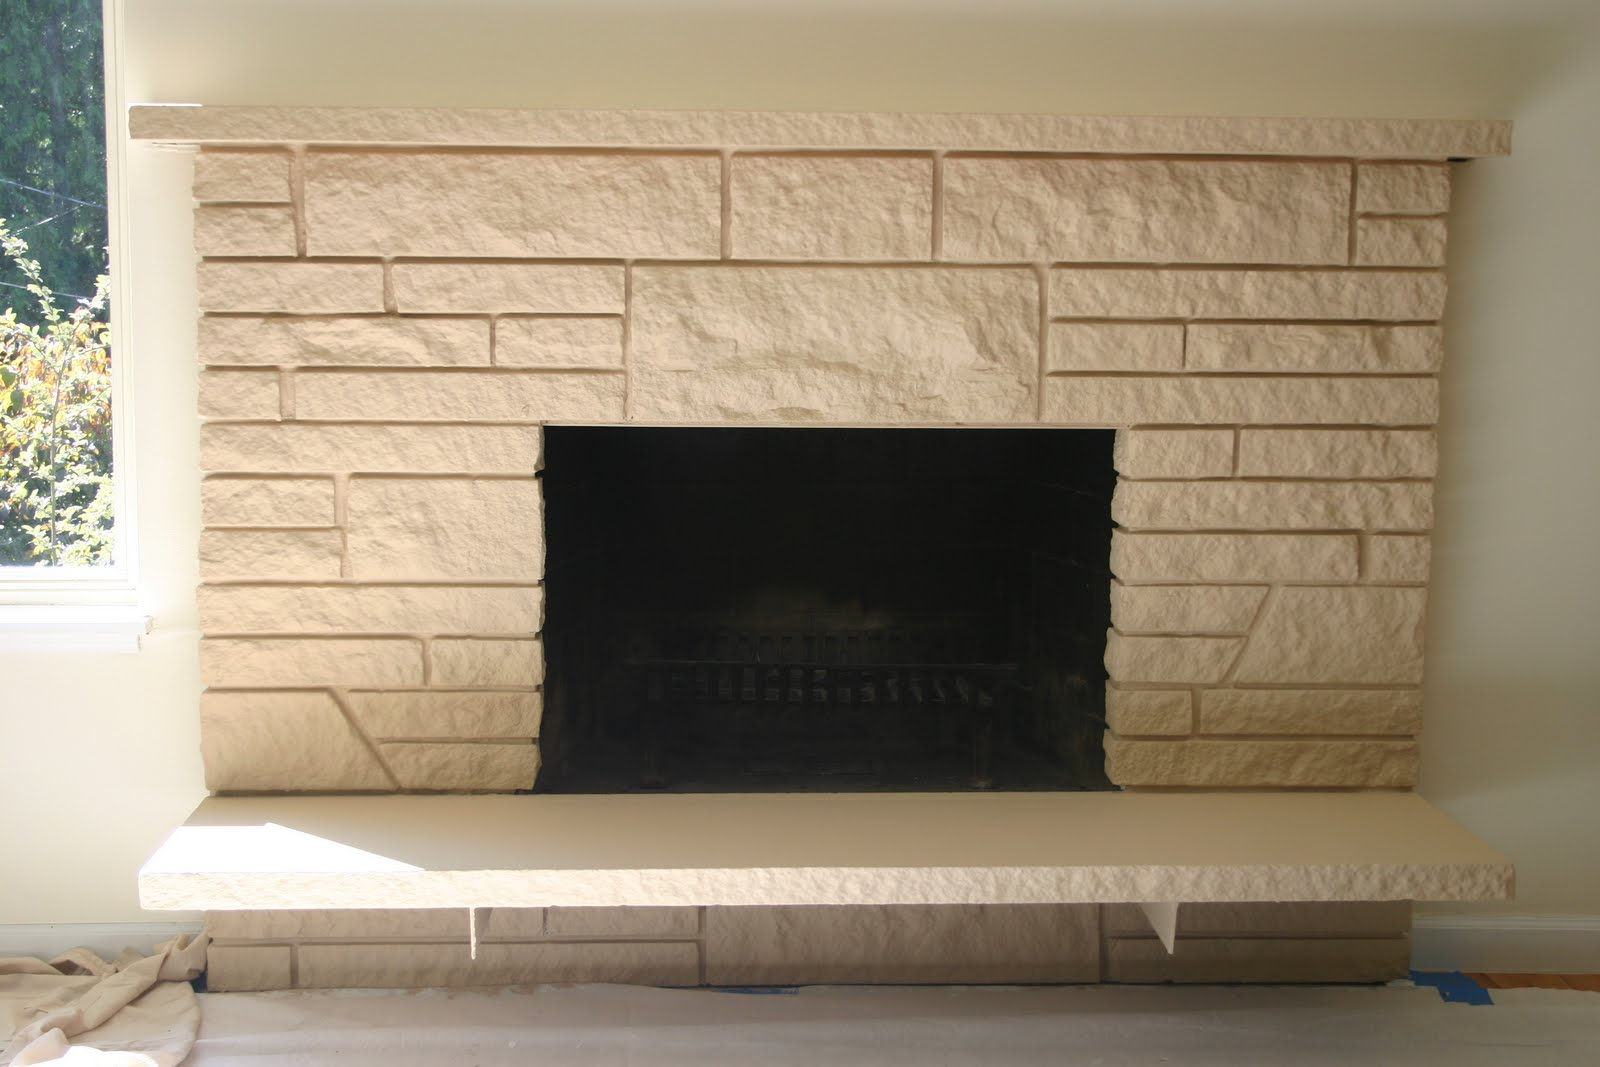 Best Color to Paint Brick Fireplace Elegant some Style Painted Brick Fireplace — Best Chair